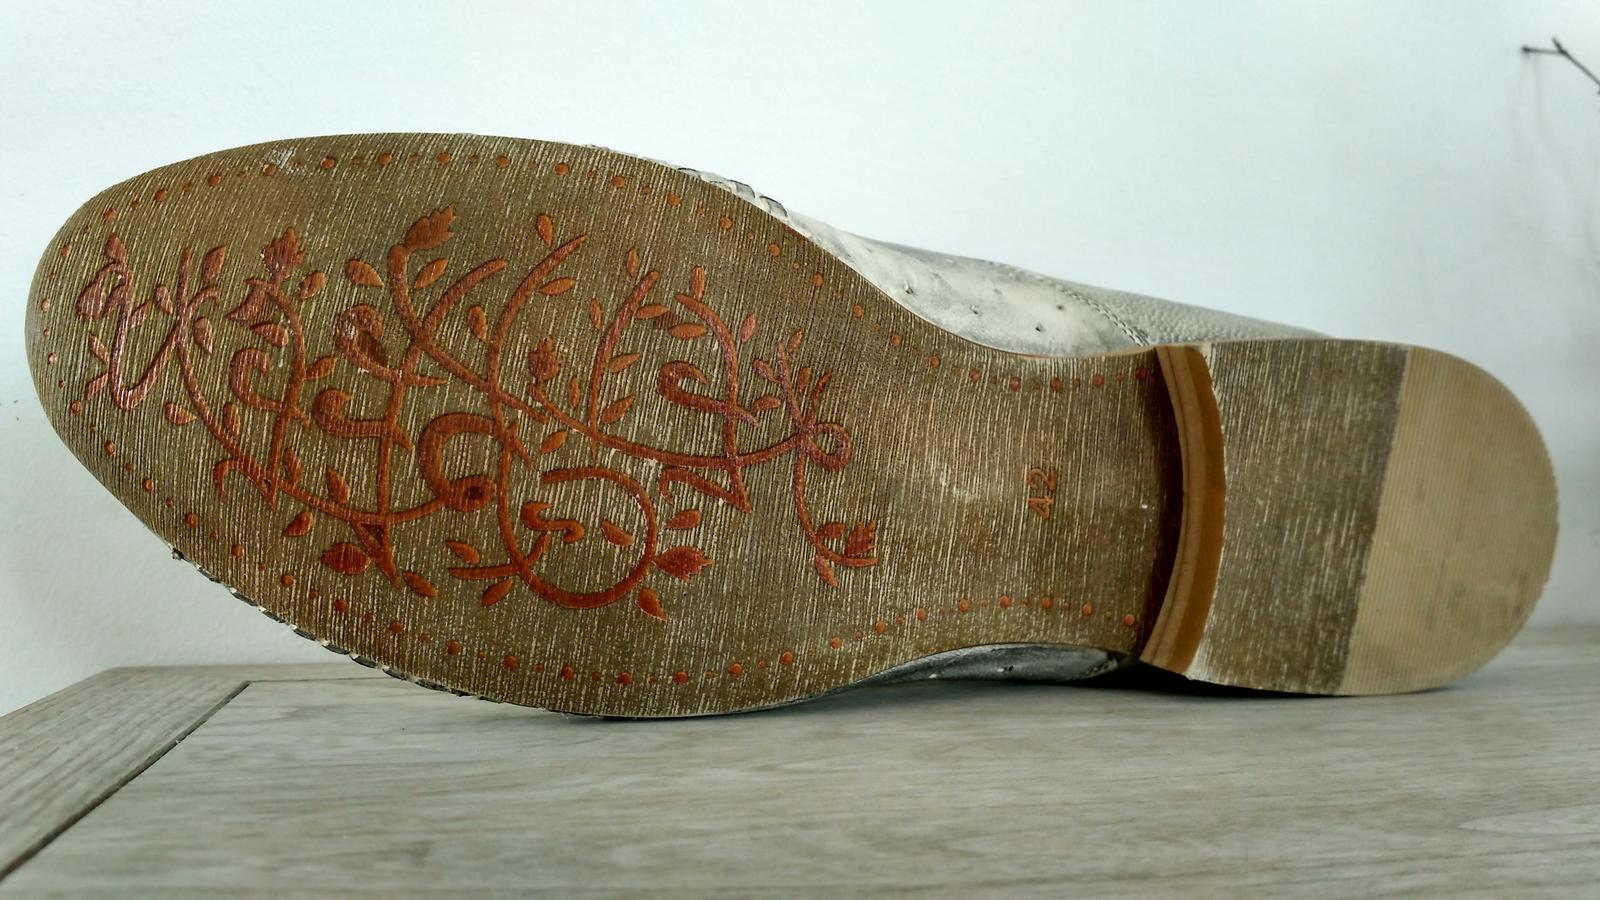 Pánske spoločenské topánky - Obrázok č. 4